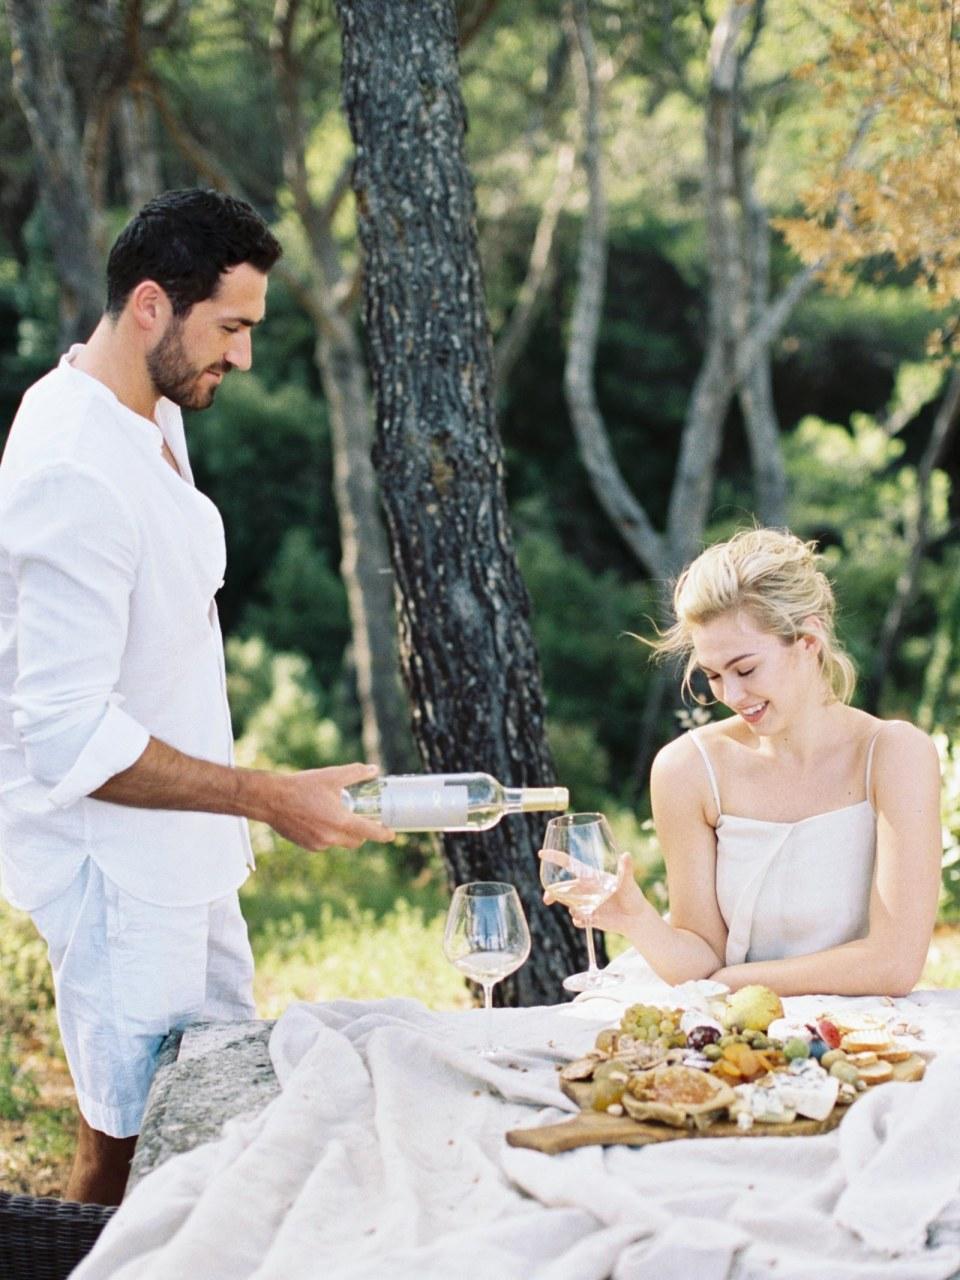 Honeymoon Photographer in Provence, France K.R. Moreno